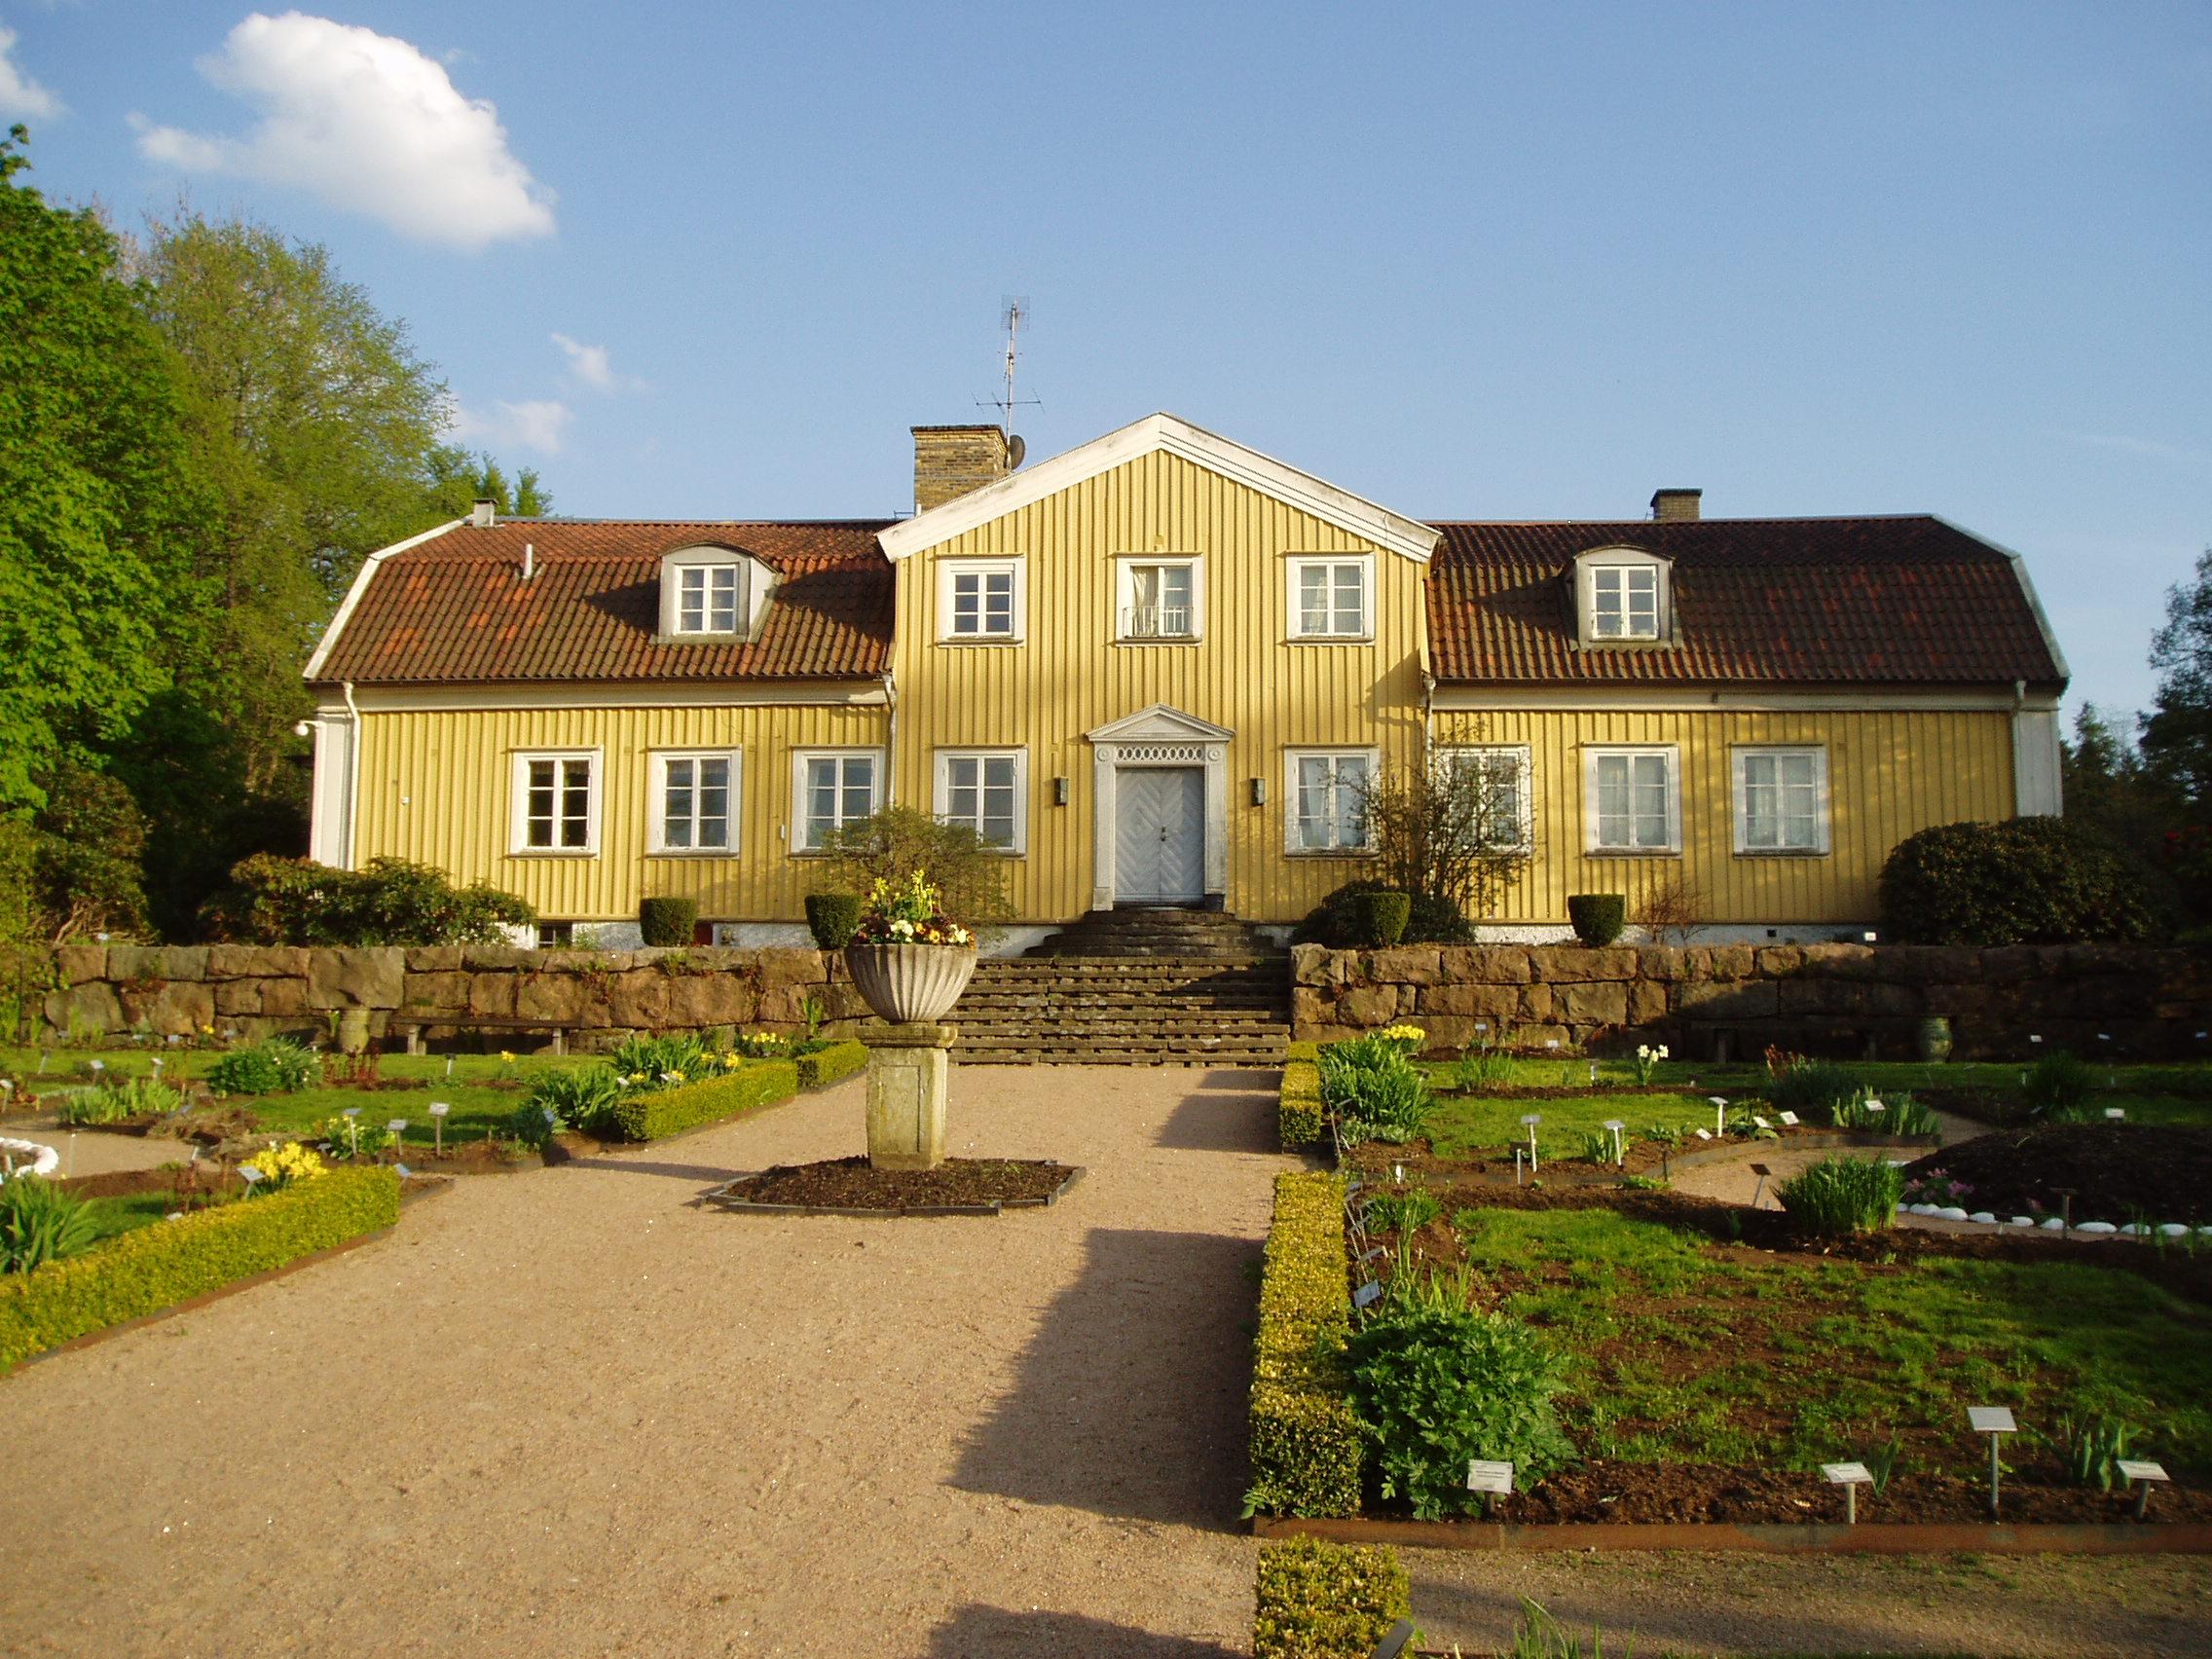 File:Stora Anggarden botaniska.JPG - Wikimedia Commons